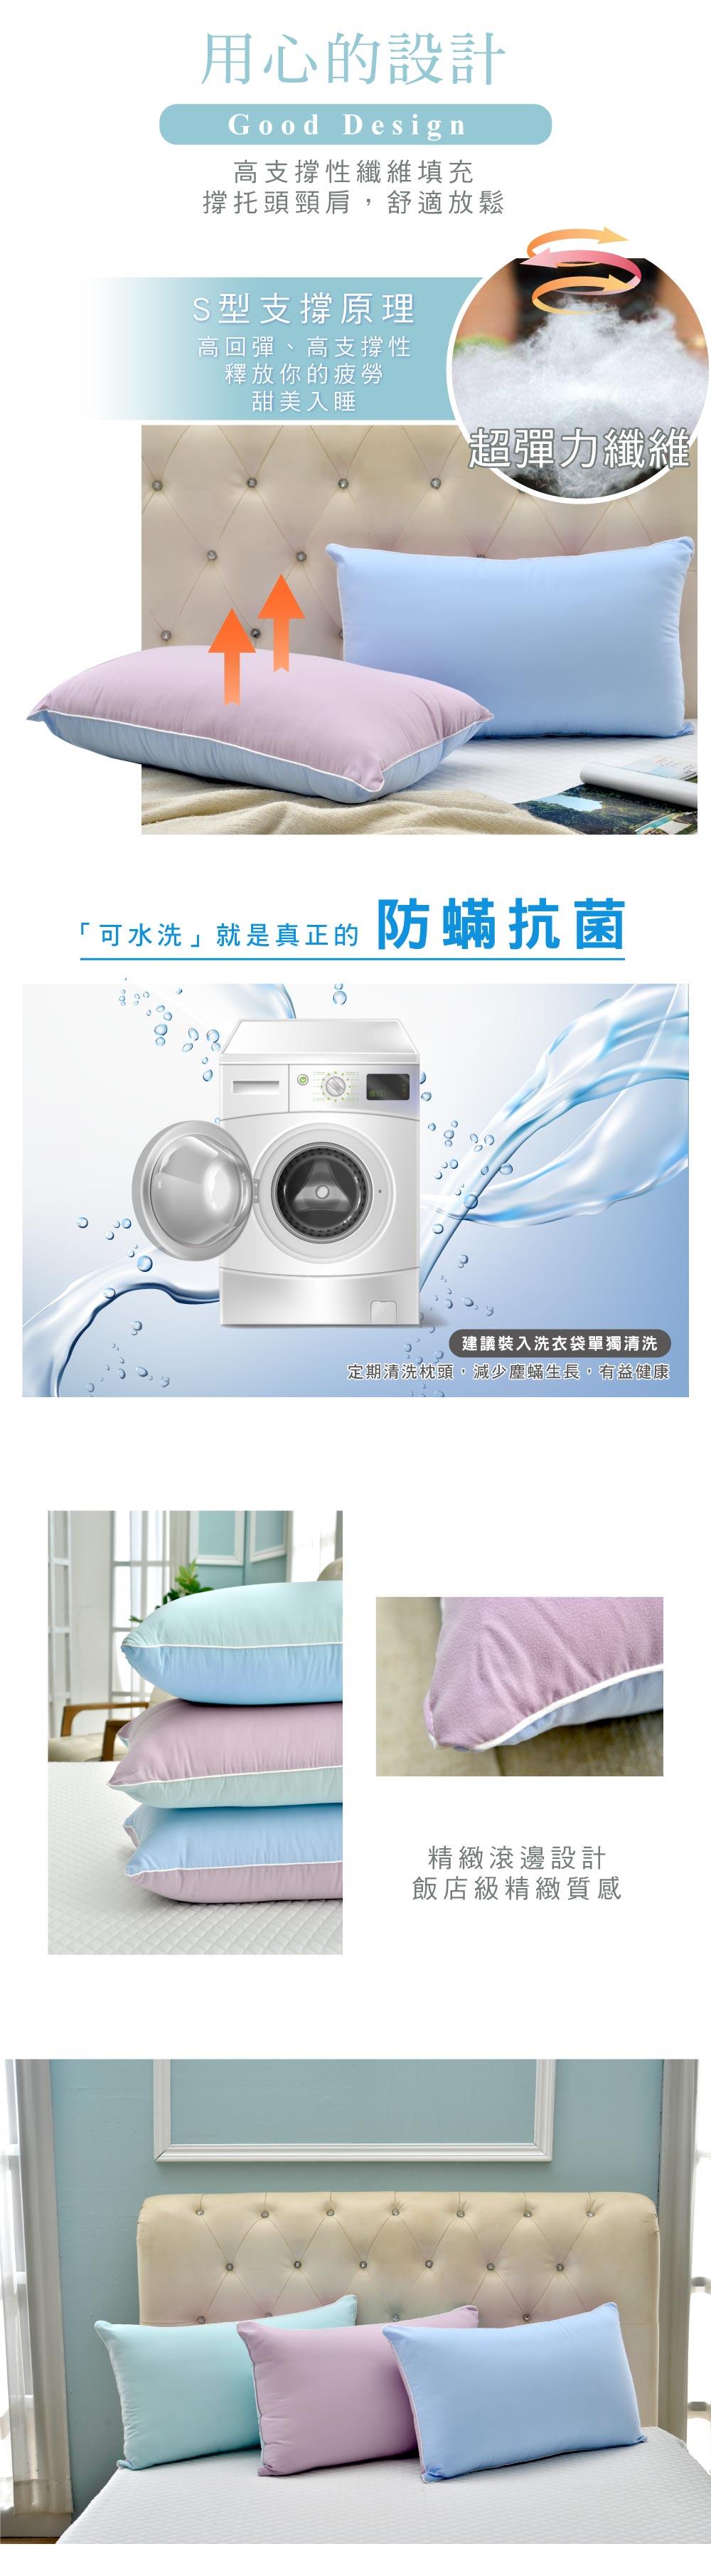 水洗枕,La Belle,防蹣抗菌